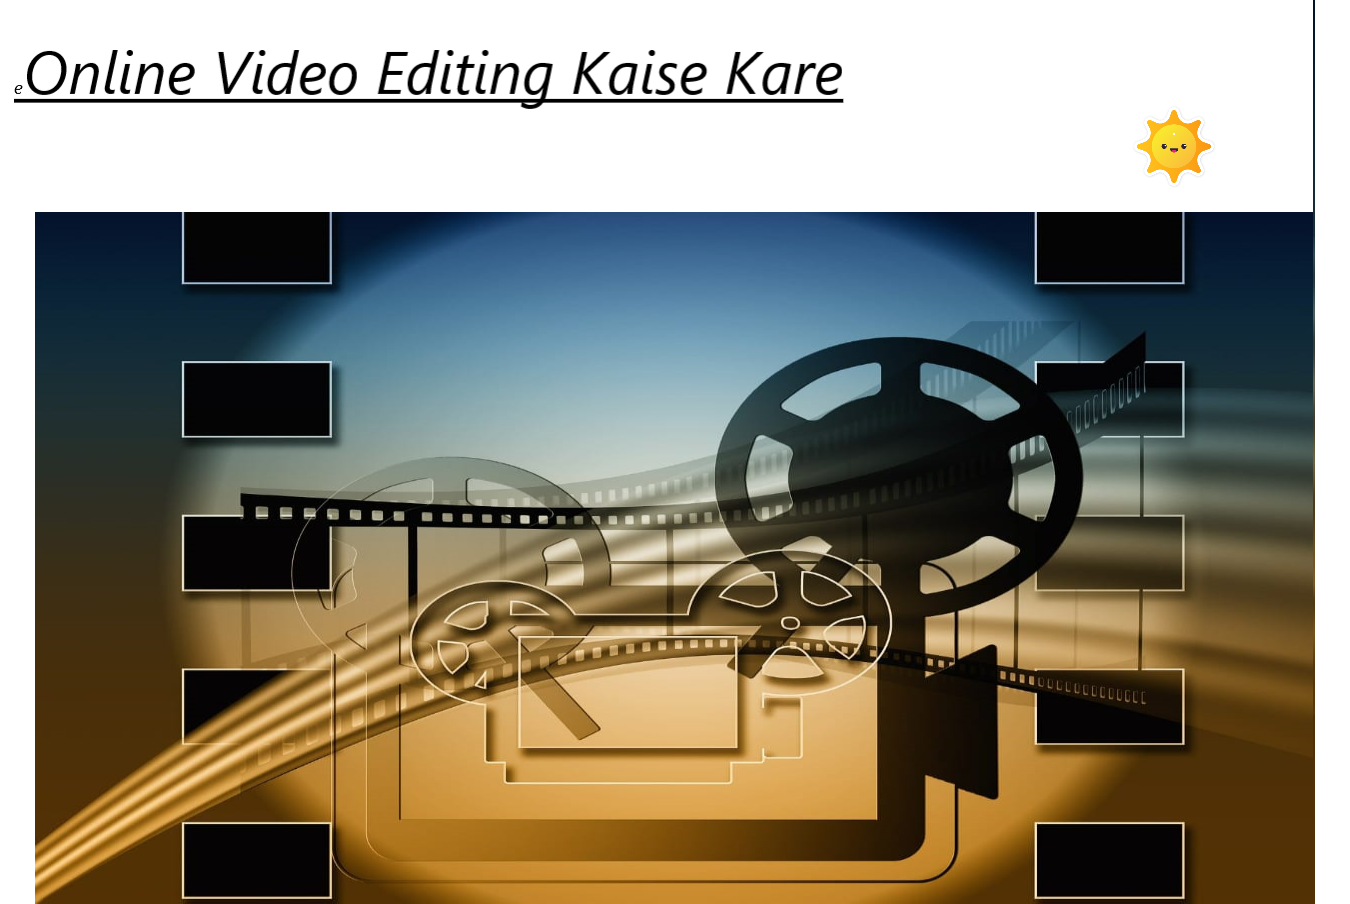 Online Video Editing Kaise Kare In Hindi बिना किसी सोफ्टवेयर